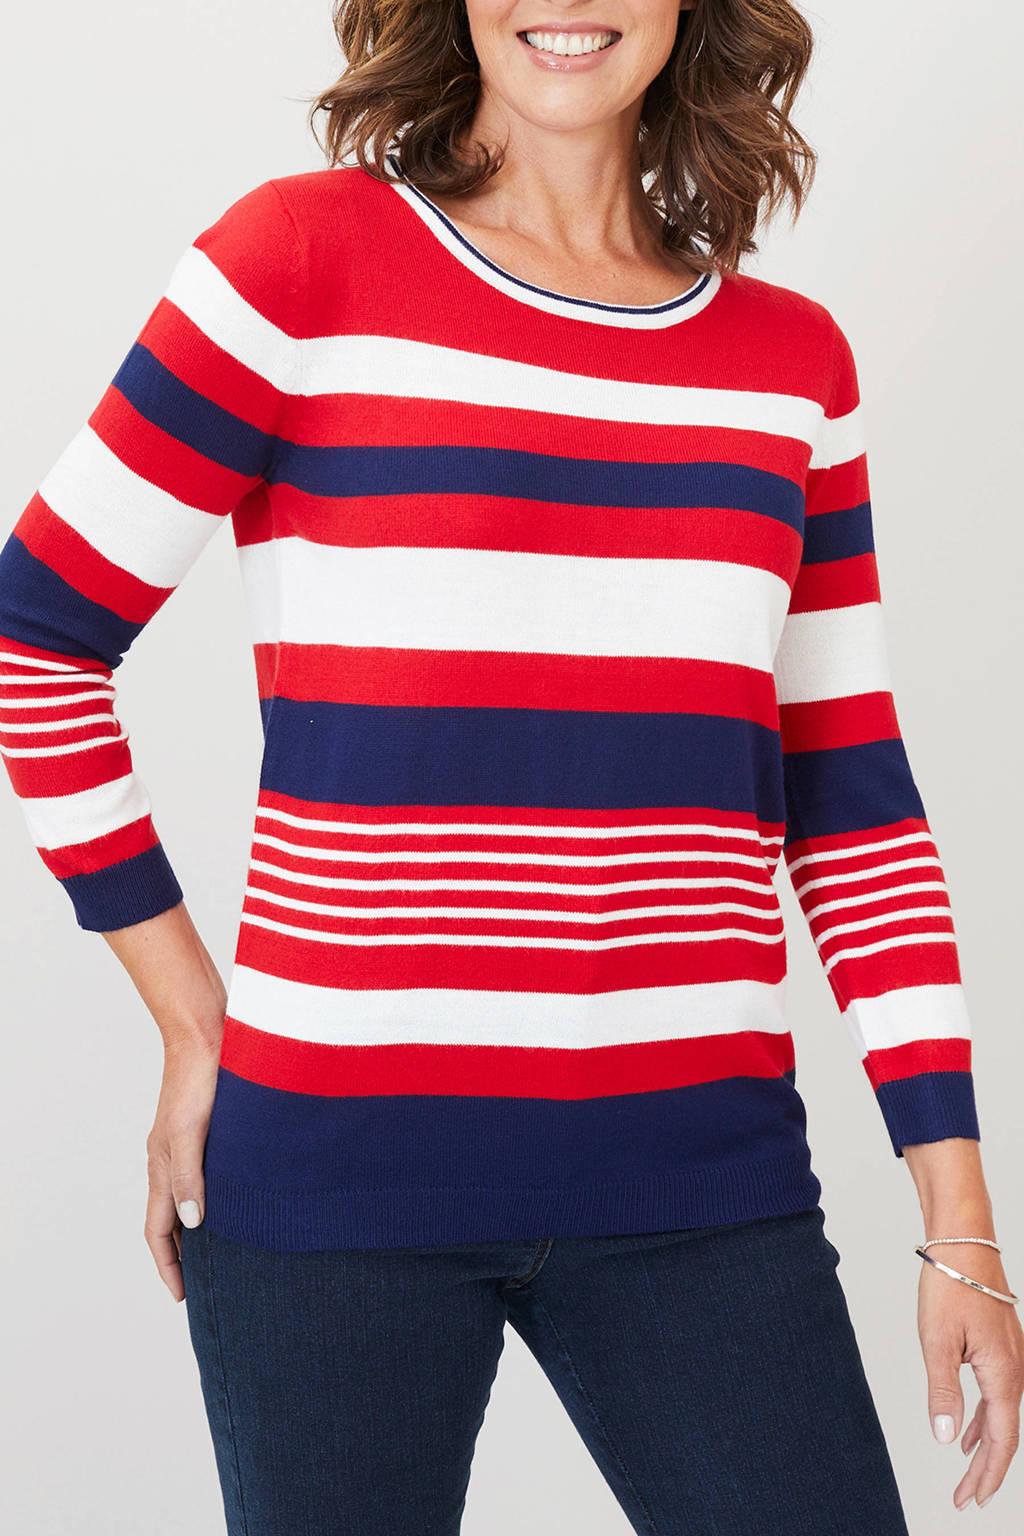 Julipa gestreepte fijngebreide trui rood/wit/donkerblauw, Rood/wit/donkerblauw